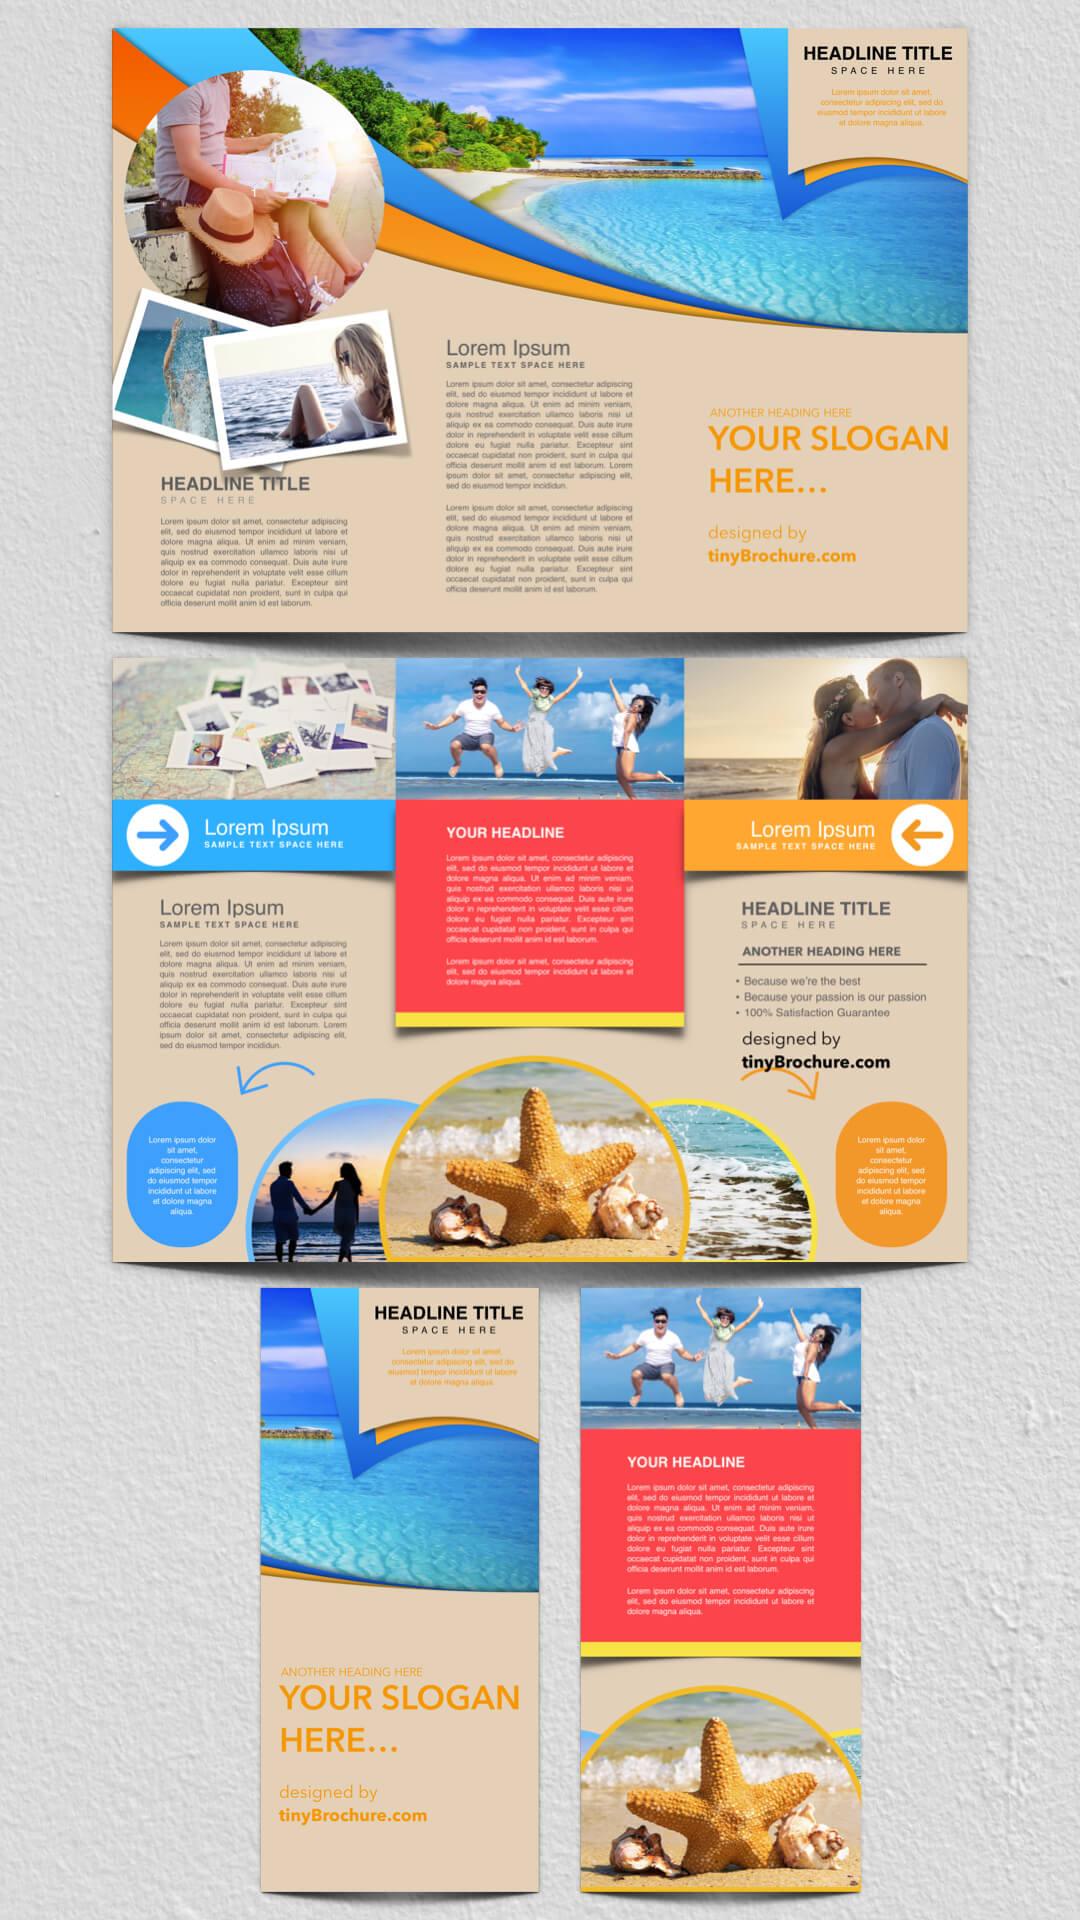 Travel Brochure Template Google Docs | Travel Brochure Inside Google Docs Travel Brochure Template